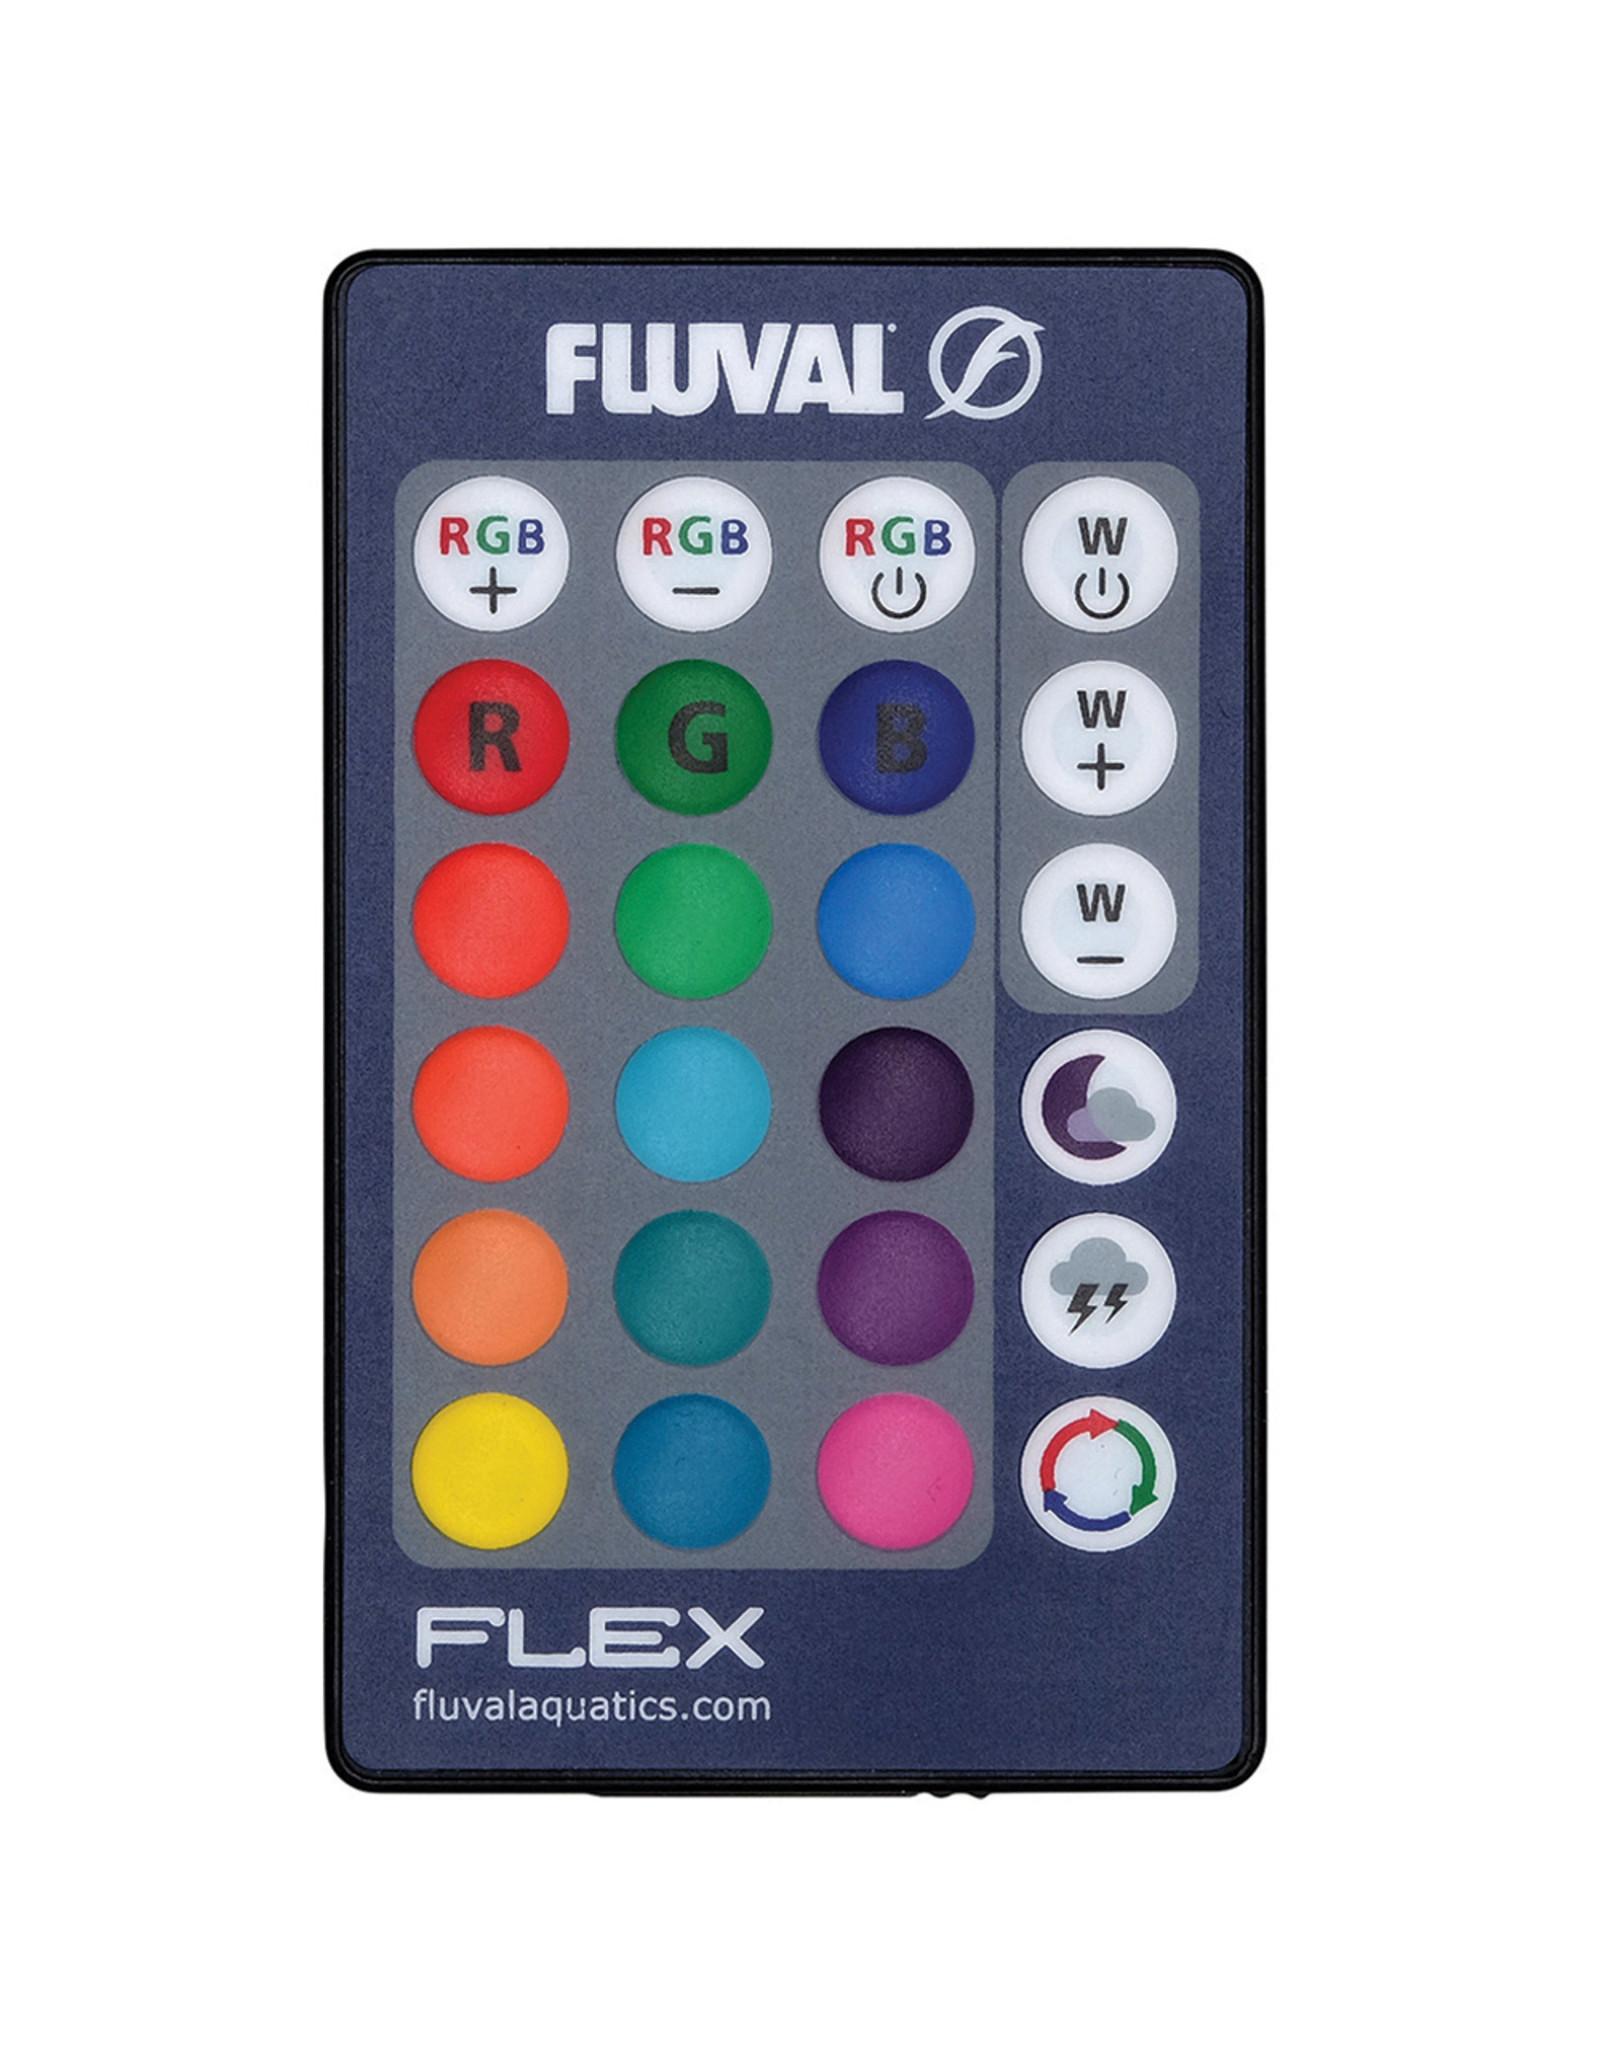 Fluval FLUVAL Flex Remote Control